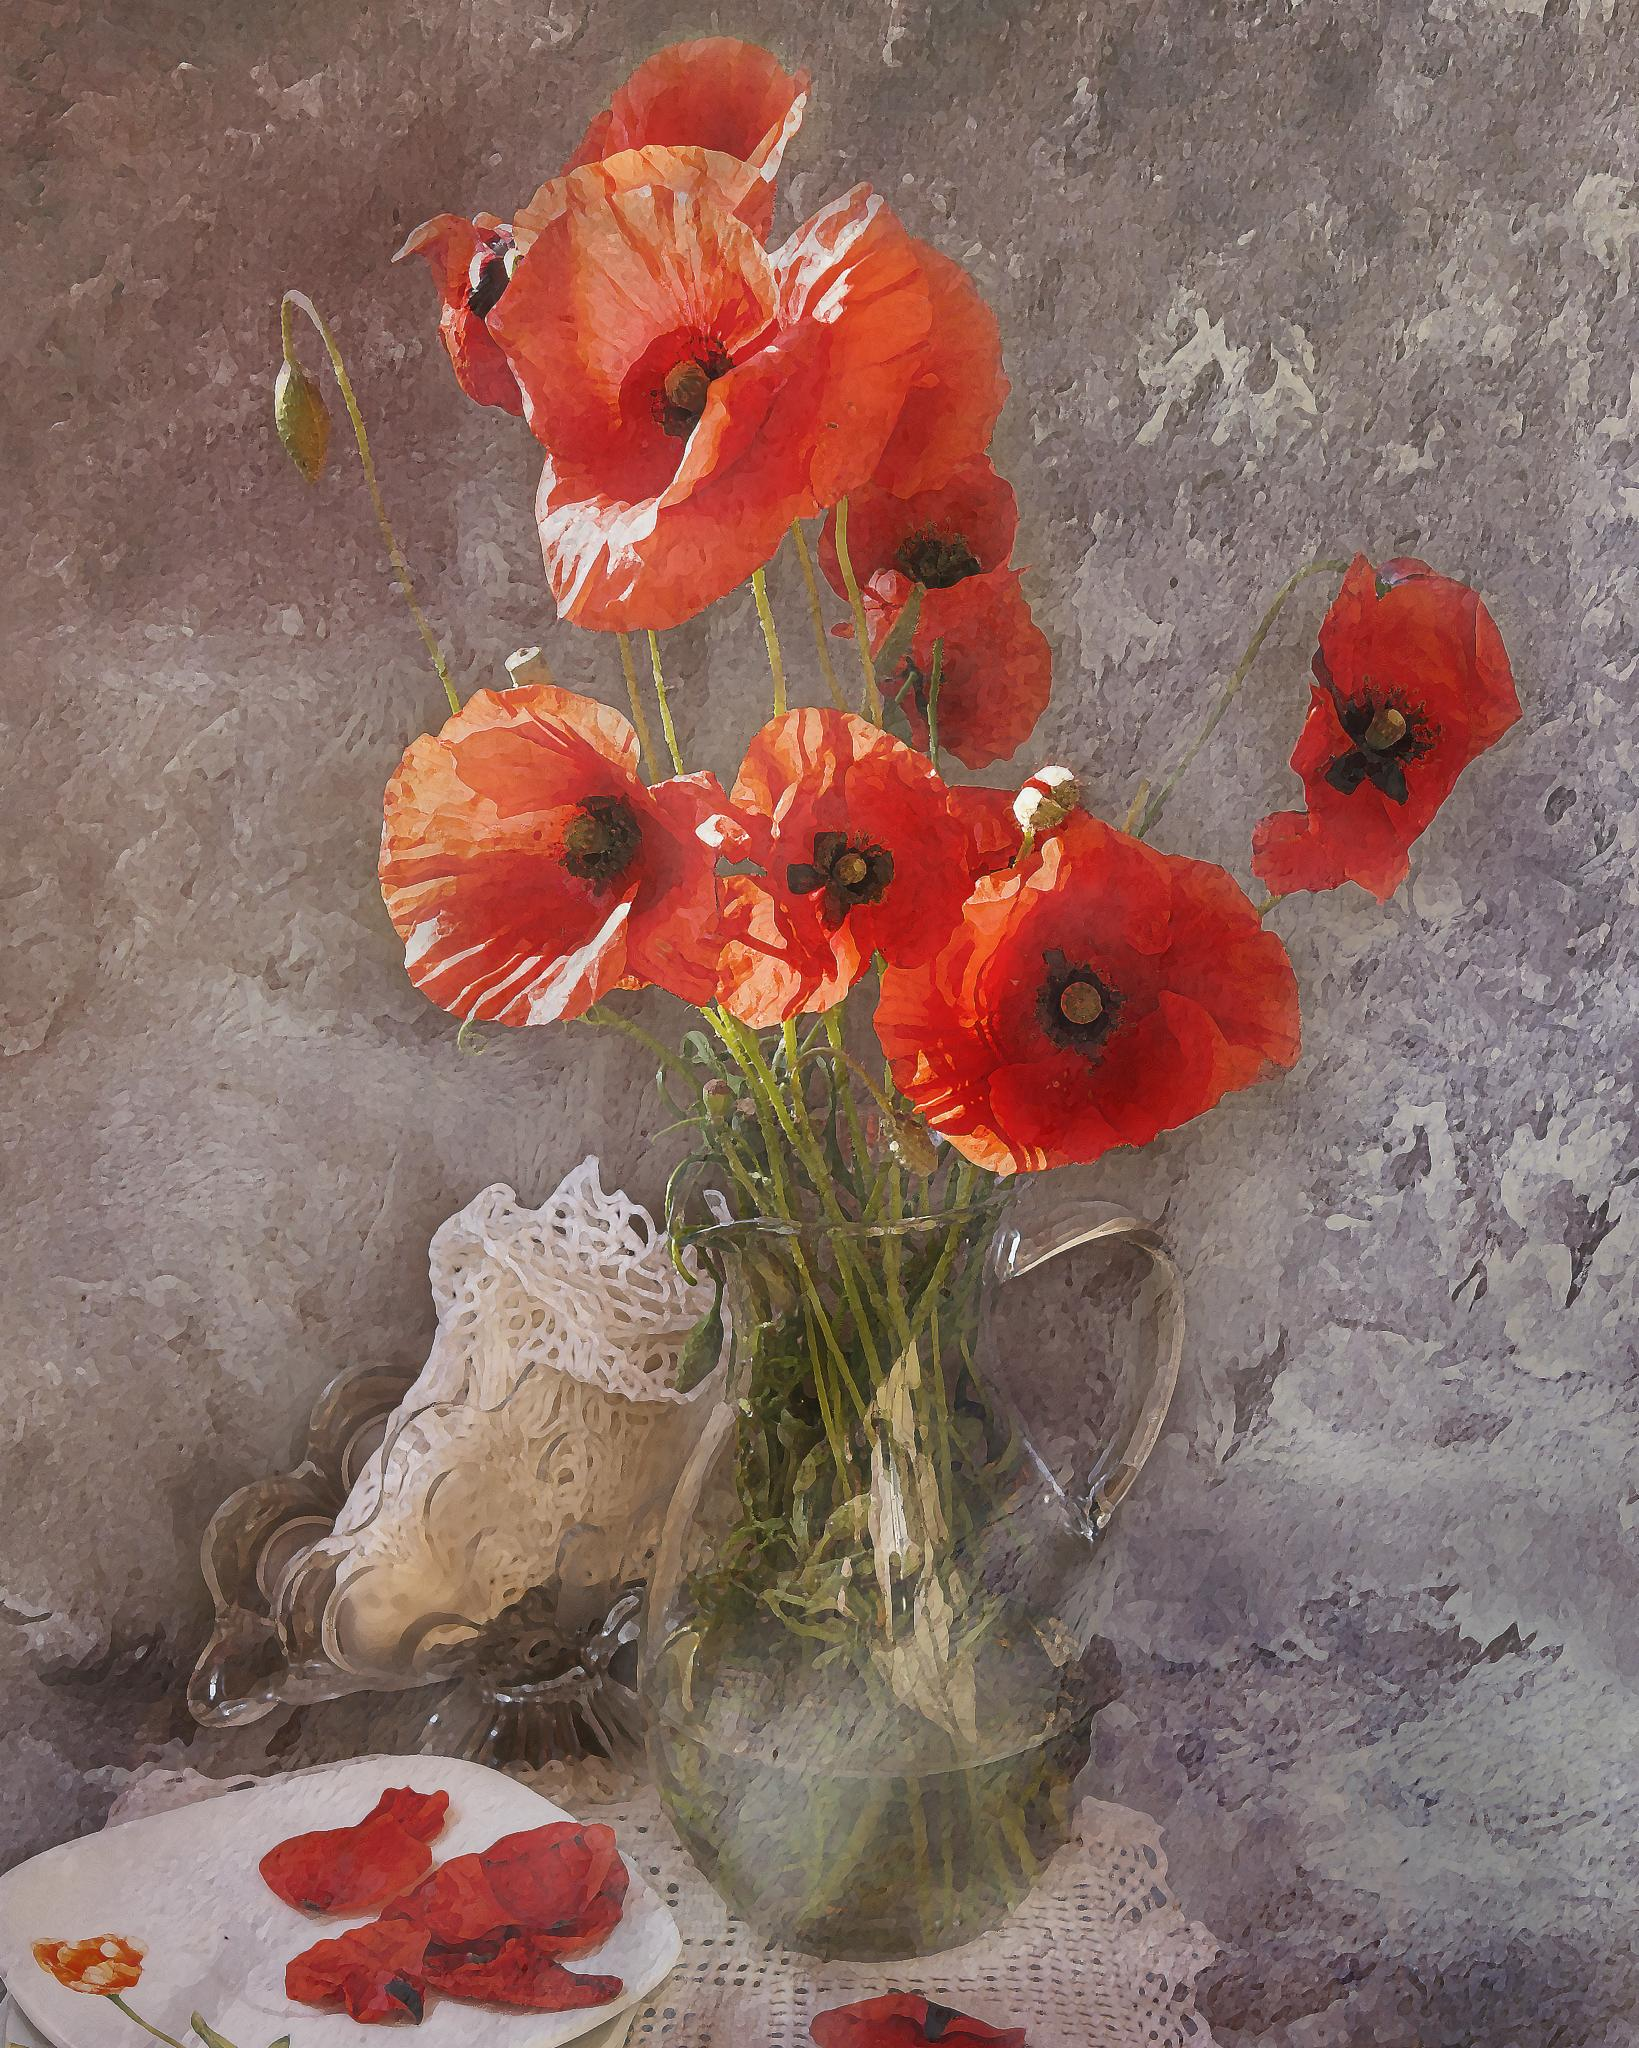 poppies by aleksandr.junajev.1